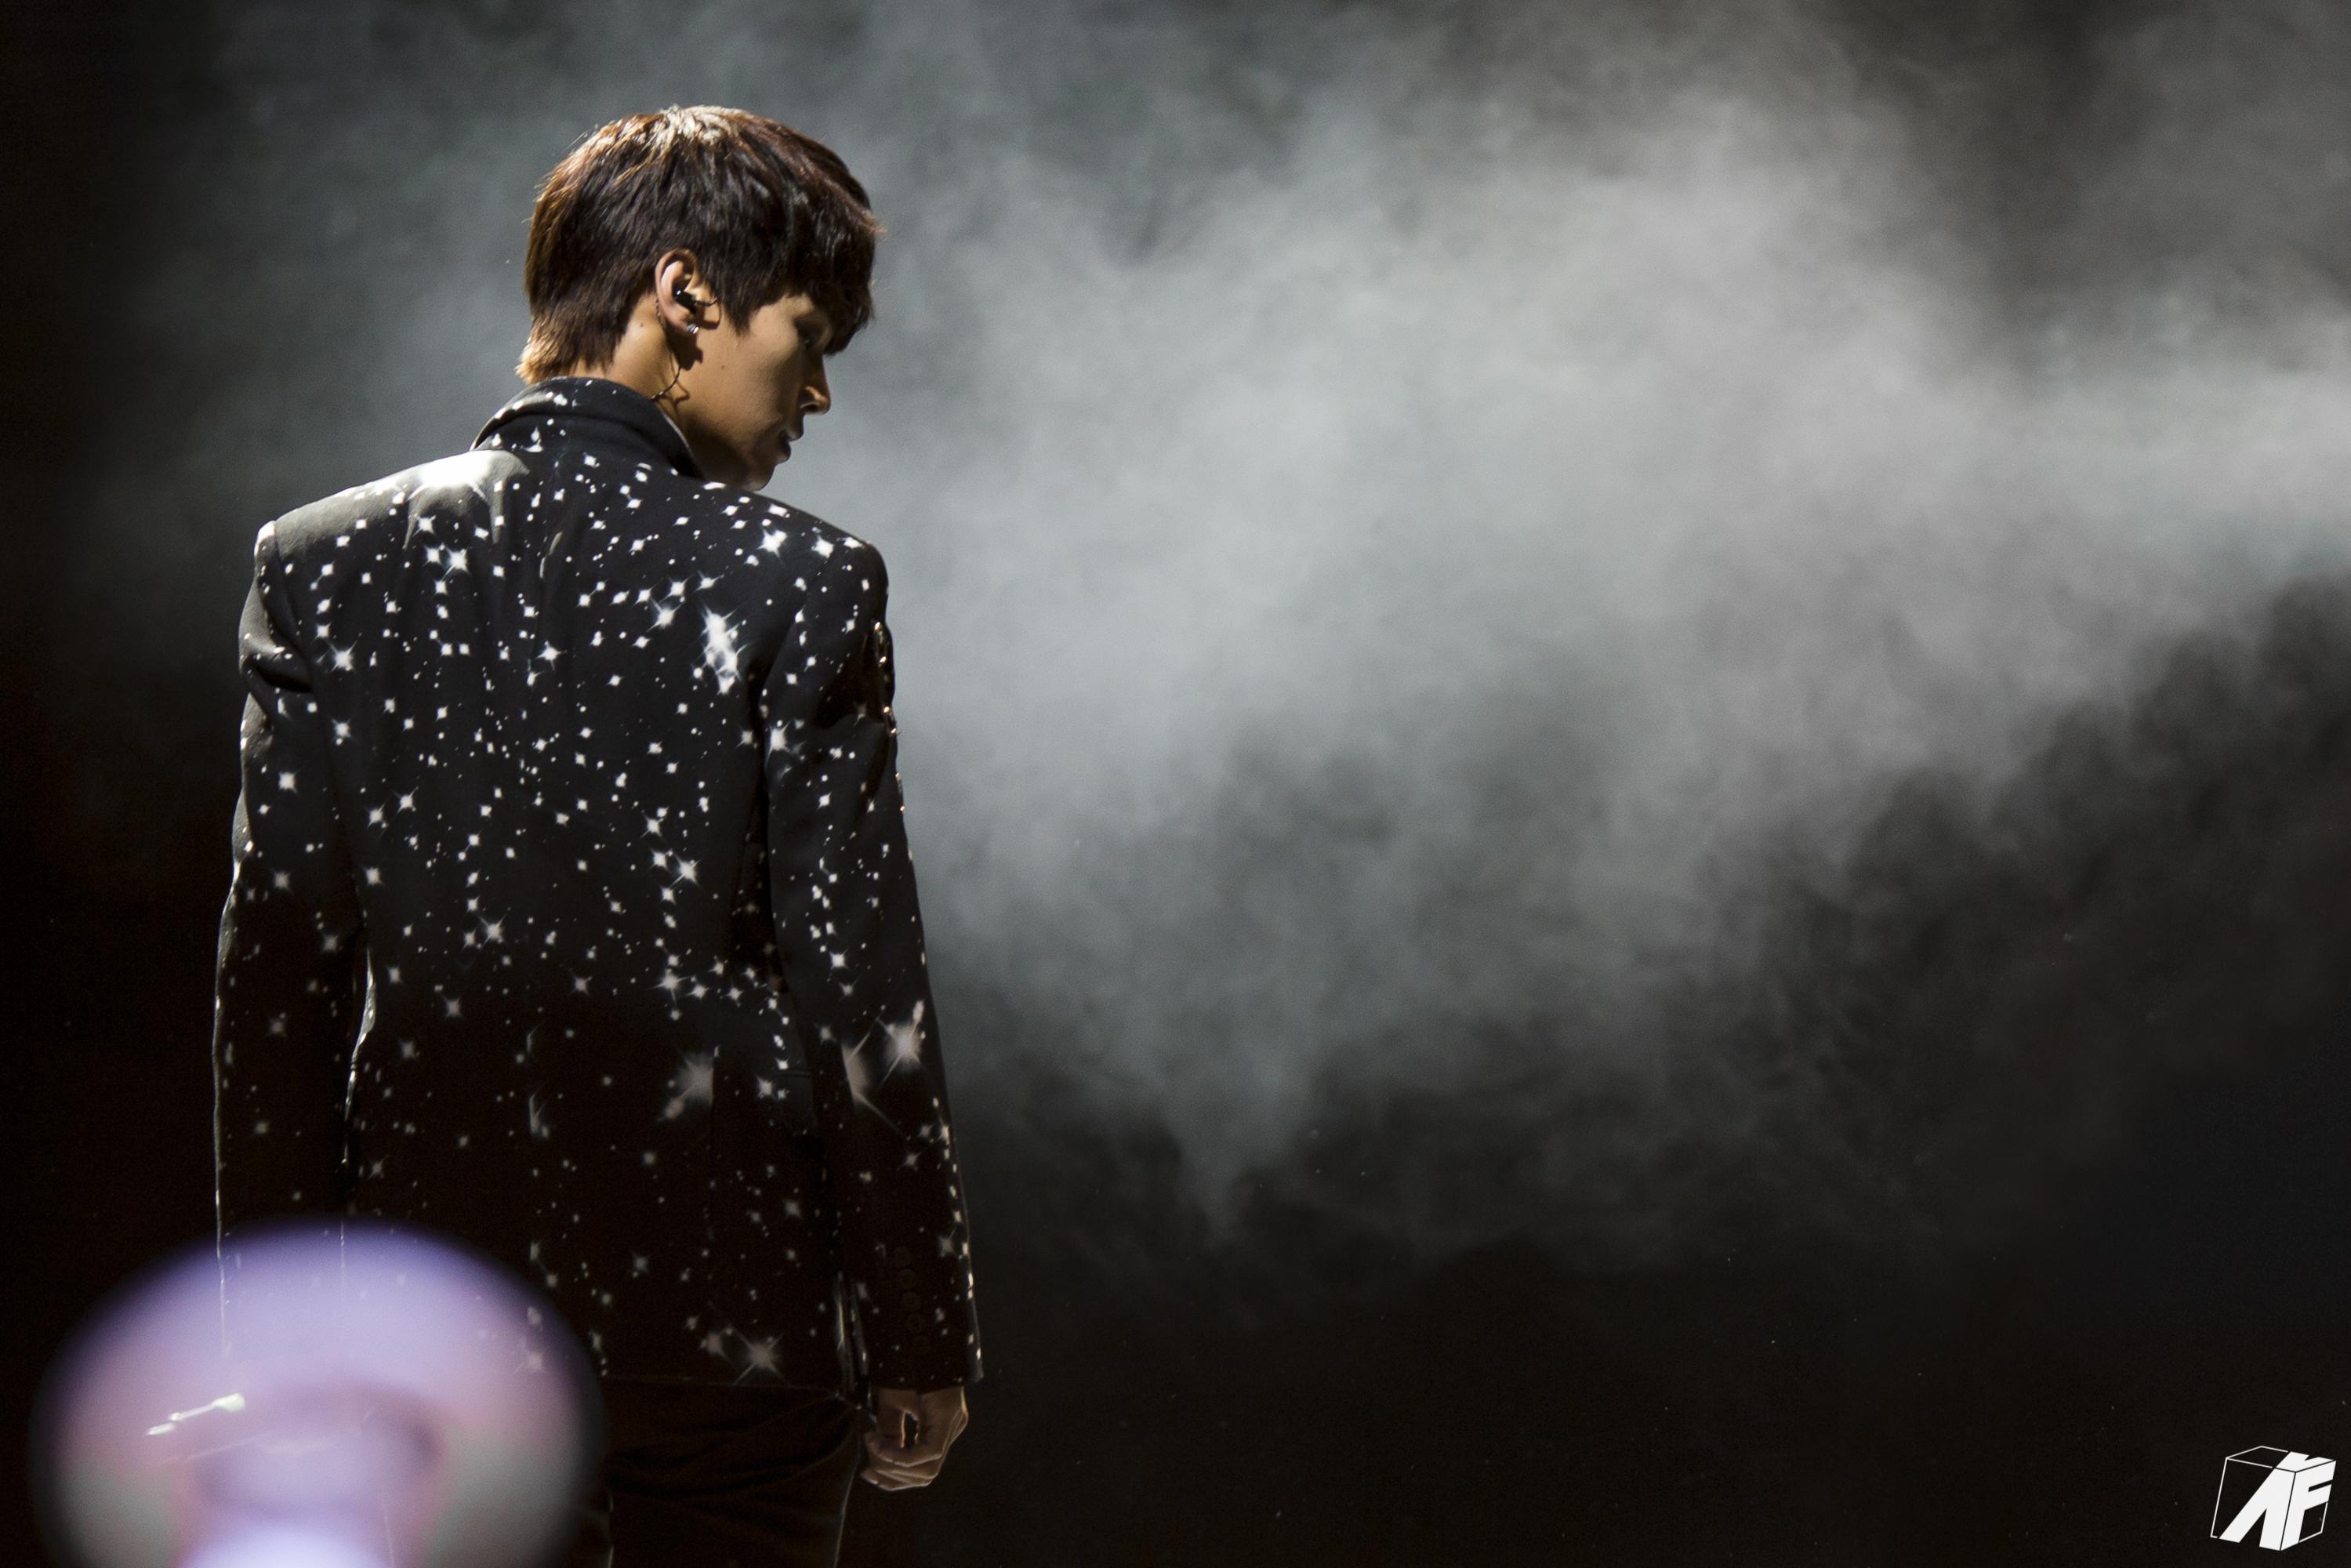 Wallpaper : water, sky, music, Canon, Korean, fans, n, kim